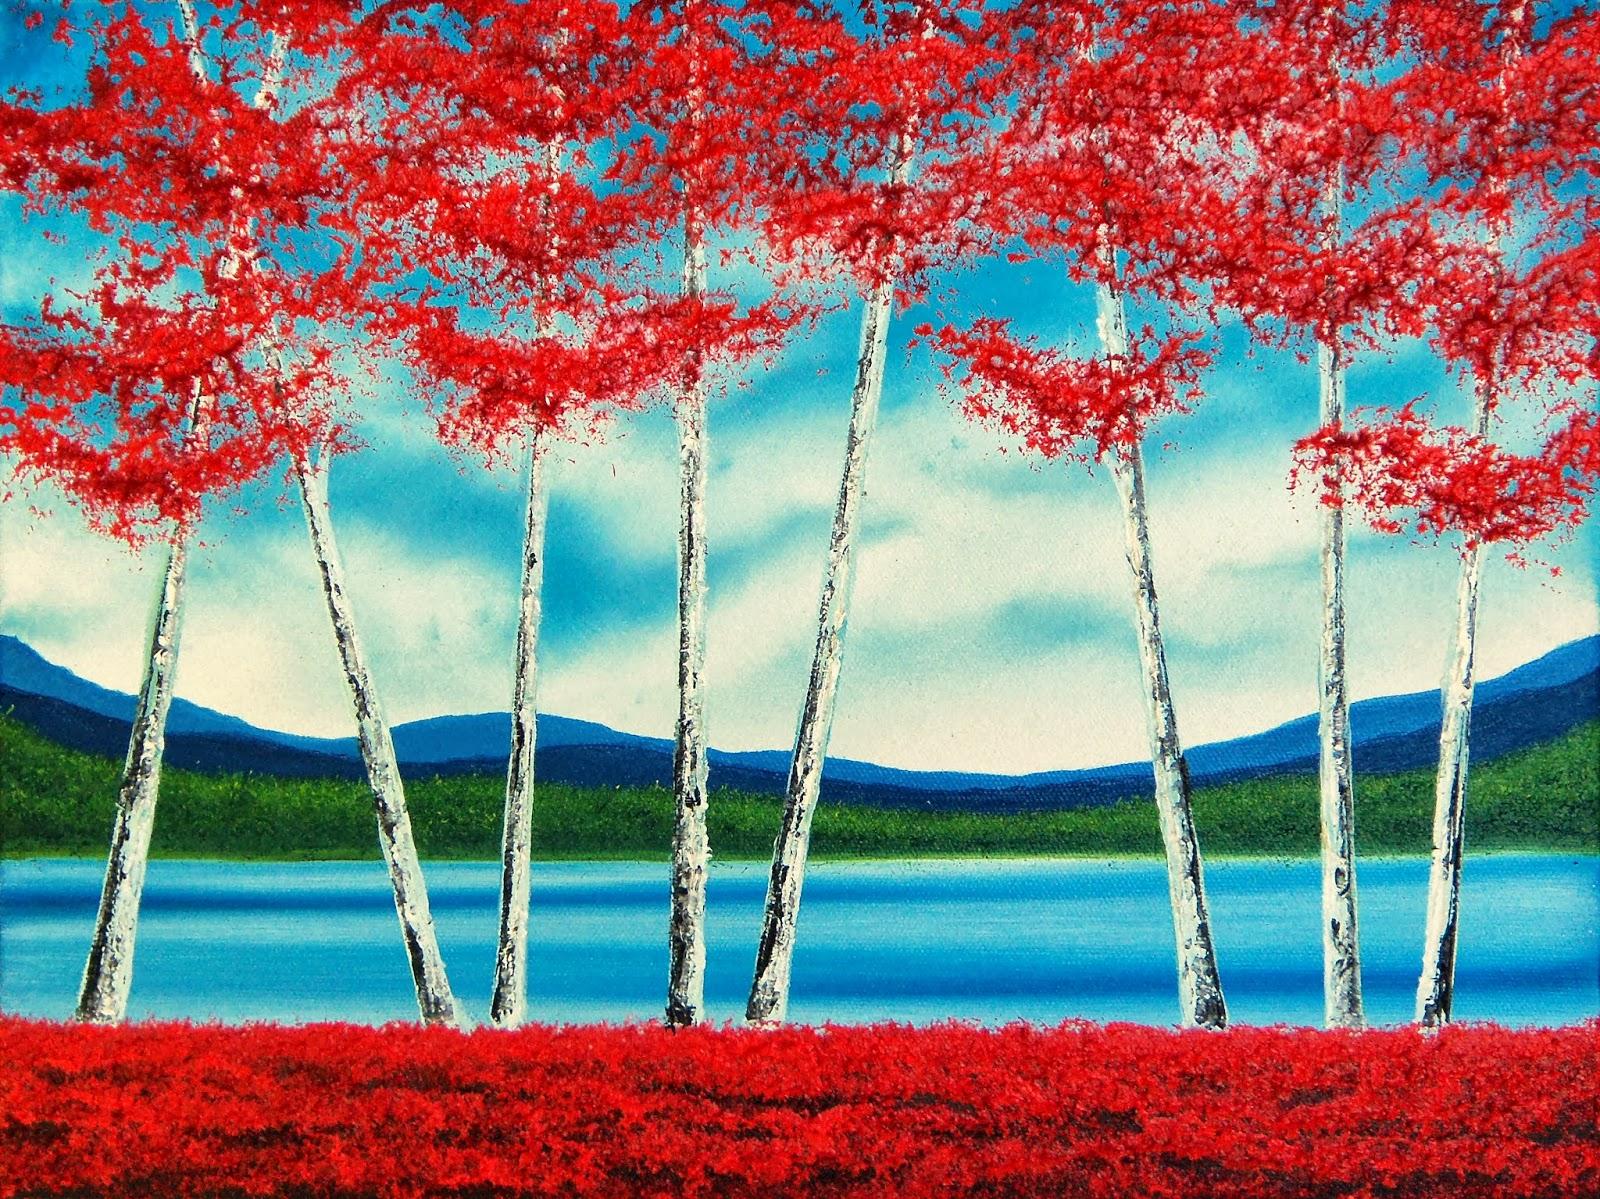 Contemporary Art Birch Tree Painting, 12 x 16, Original Oil Painting ...